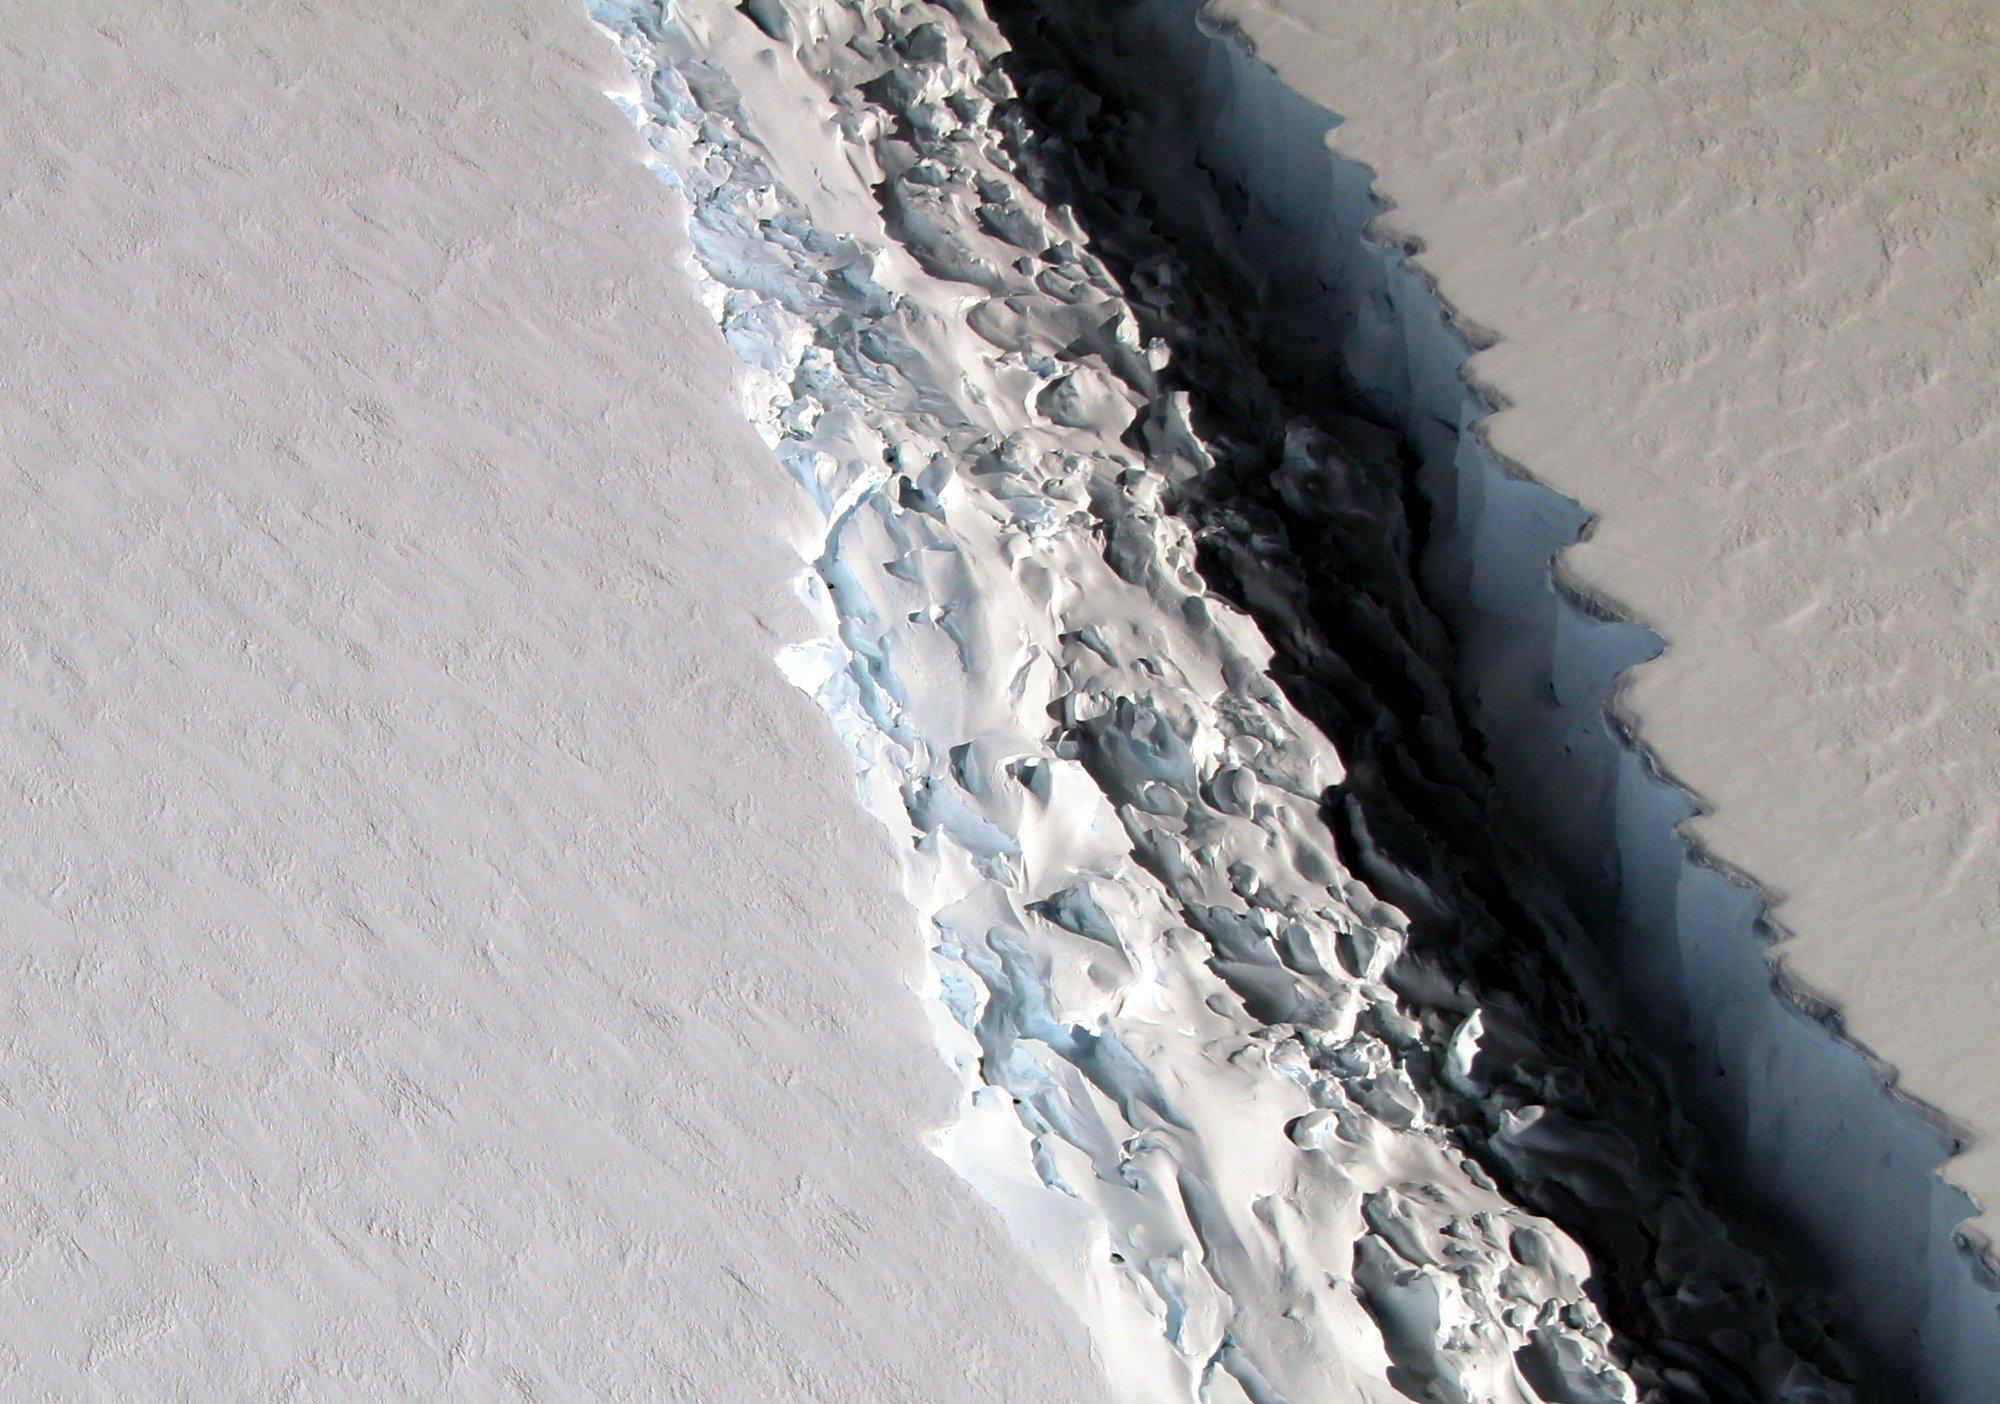 Antarctica Larsen C ice shelf rift